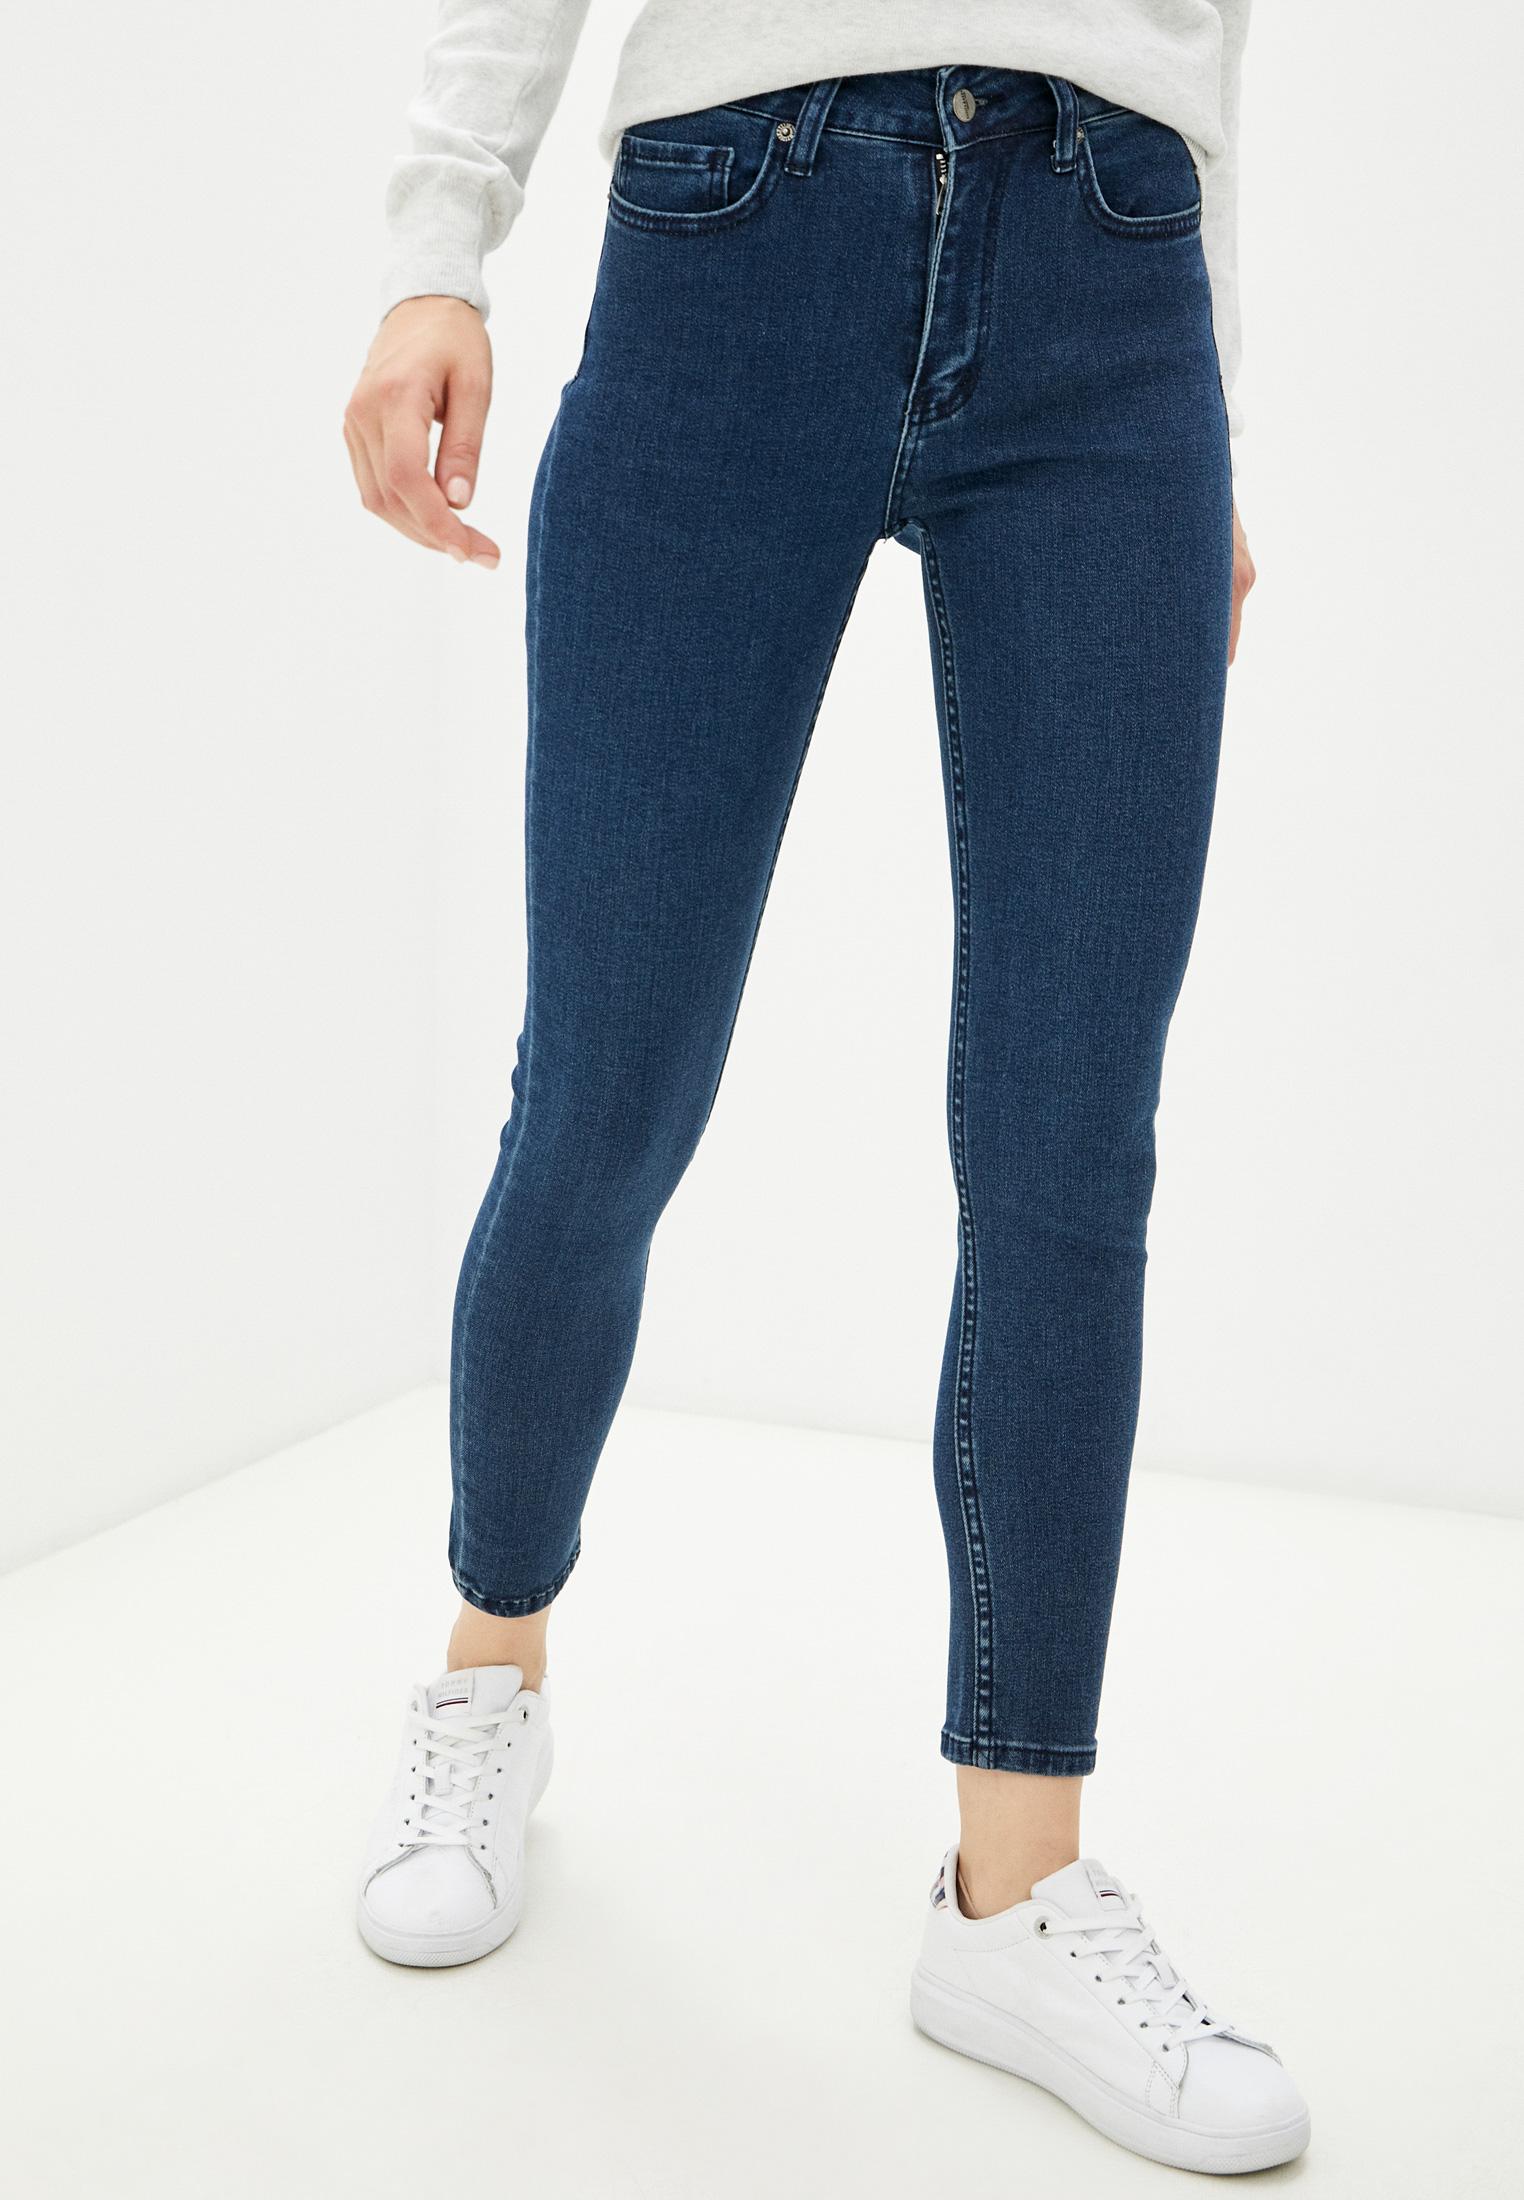 Зауженные джинсы Basics & More Джинсы Basics & More